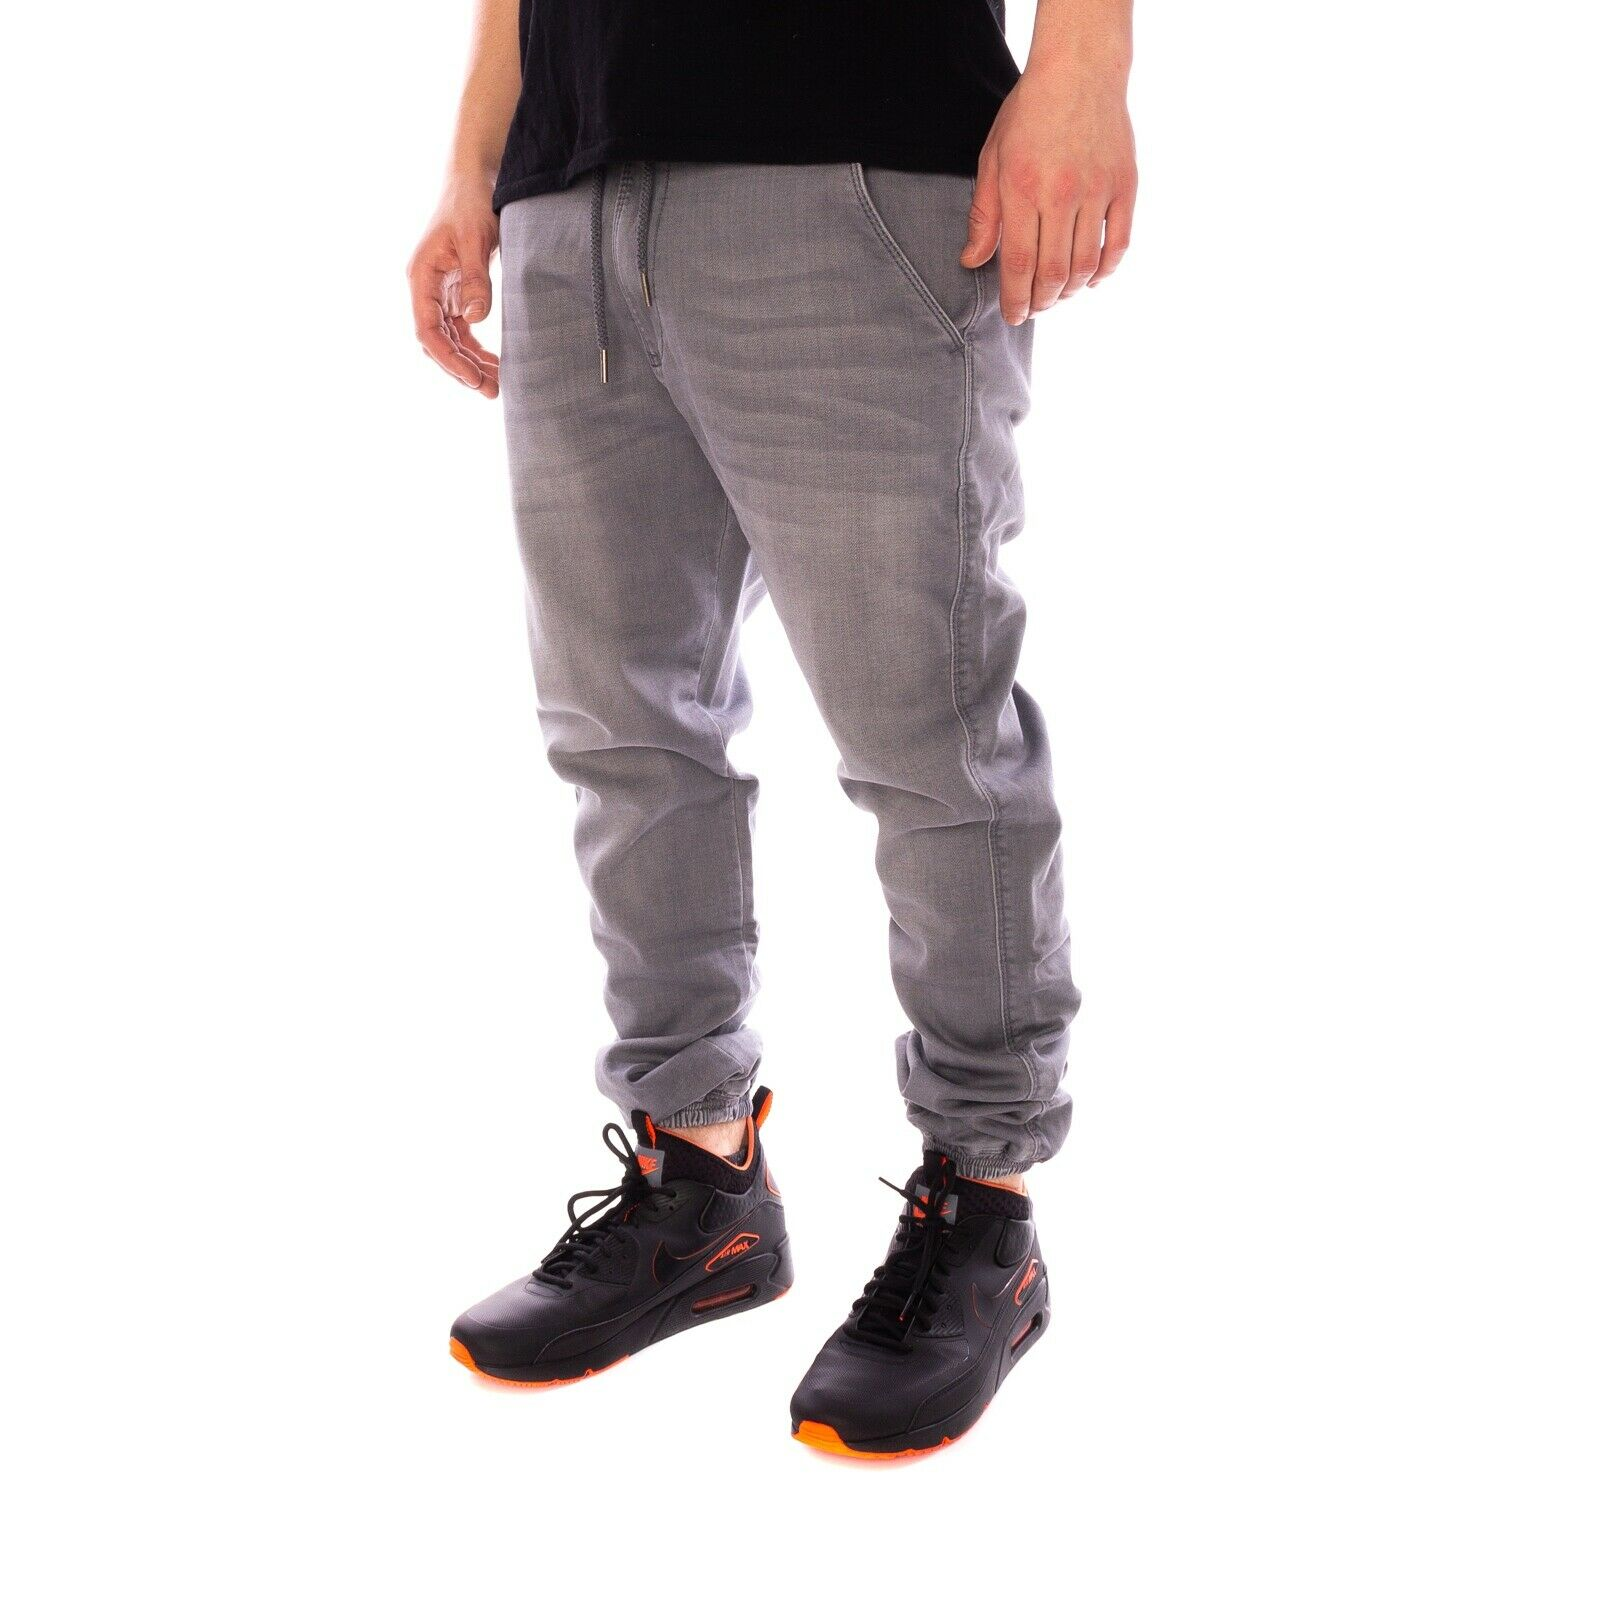 Reell Reflex 2 Hose Herren Jeans grau 16185  | Online-Exportgeschäft  | New Products  | Flagship-Store